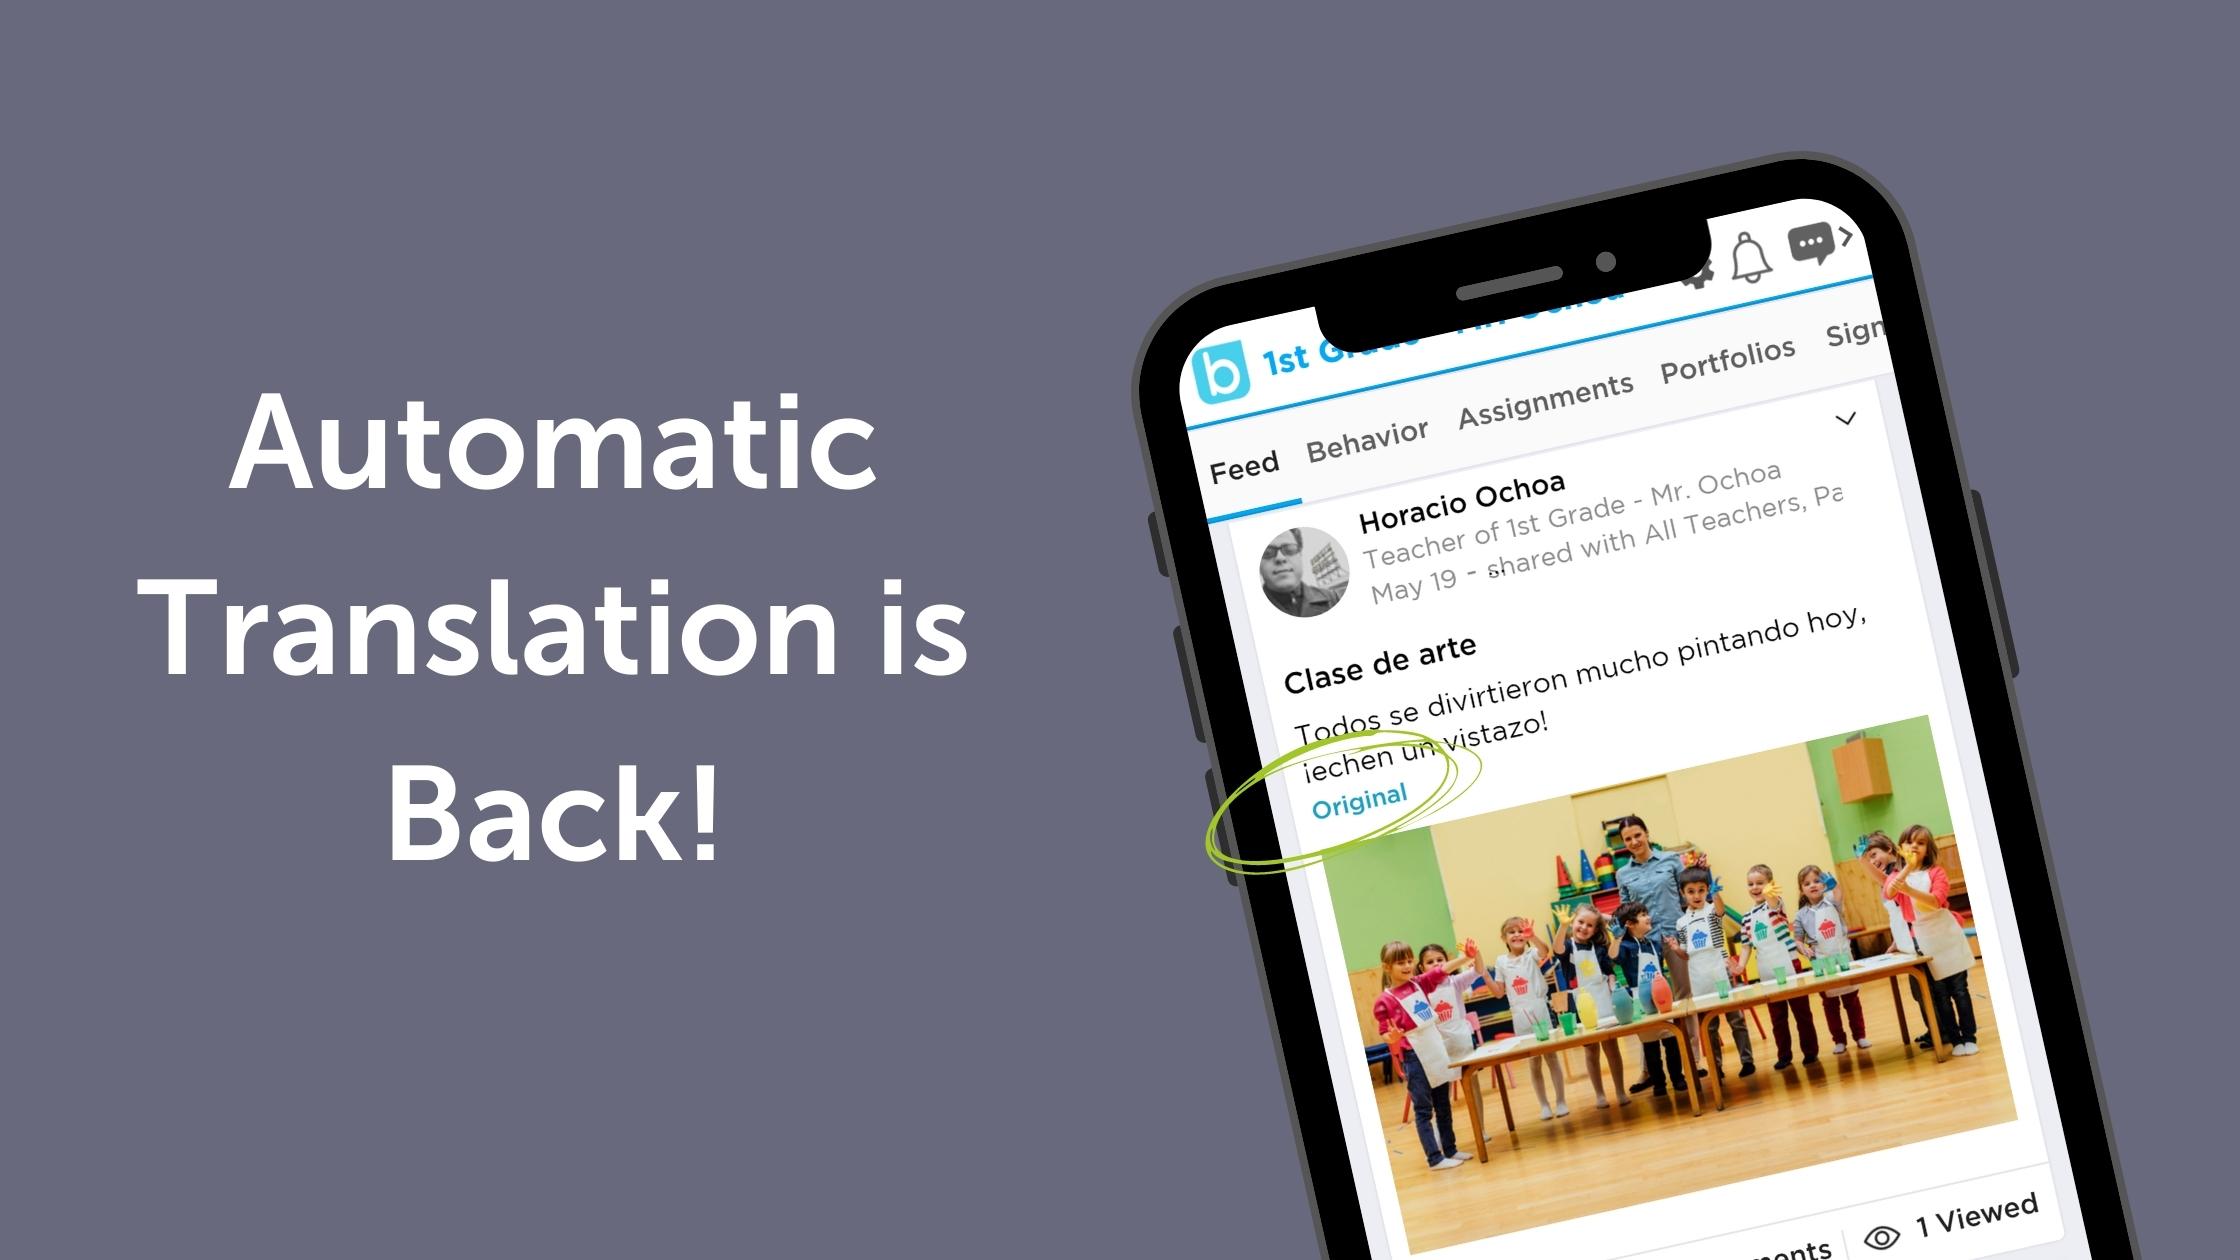 Automatic Translation is Back!